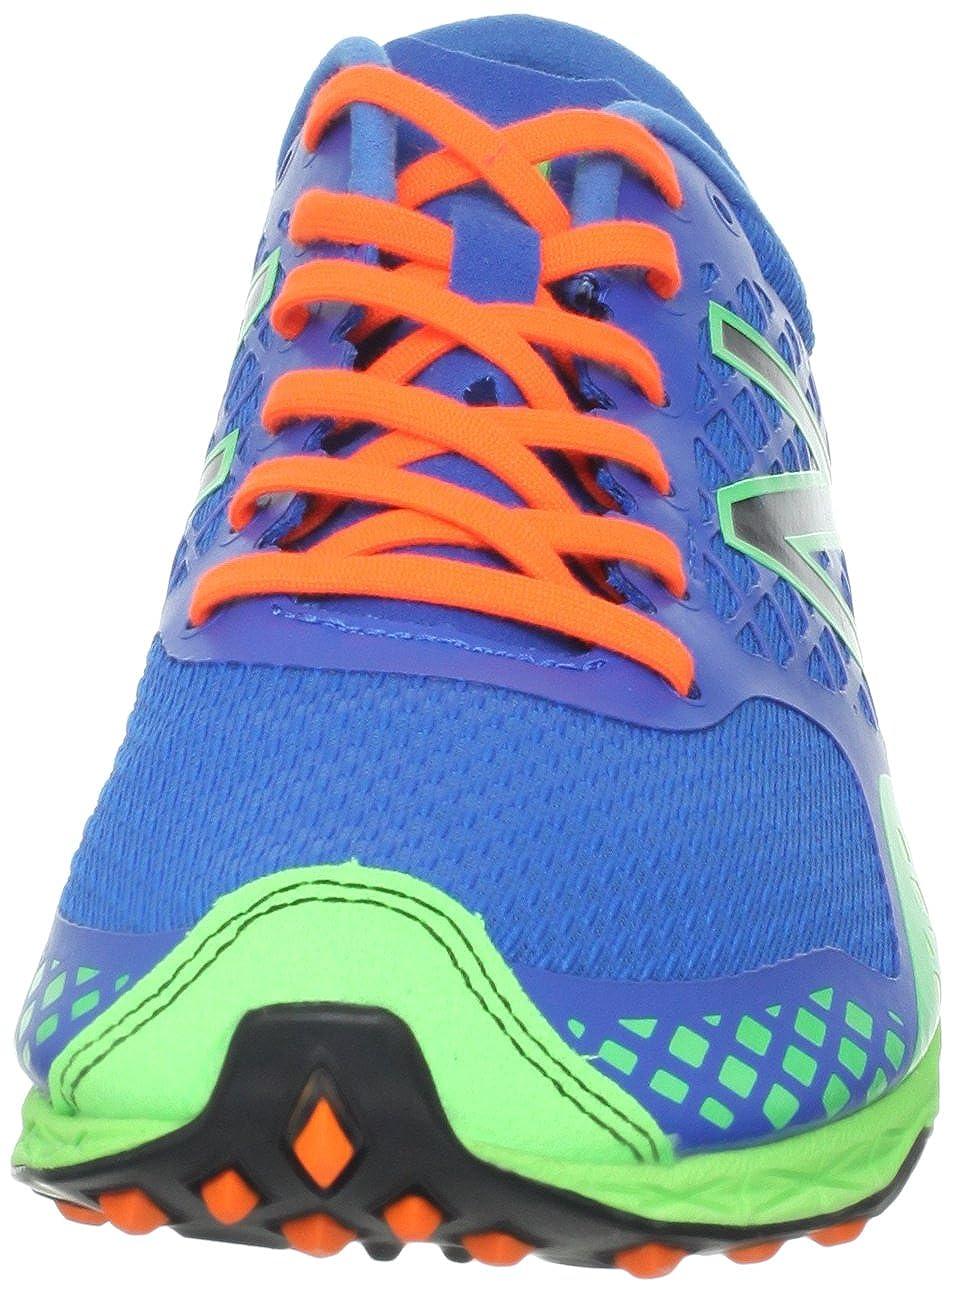 New Balance Men s MXCS900 Spike Running Shoe